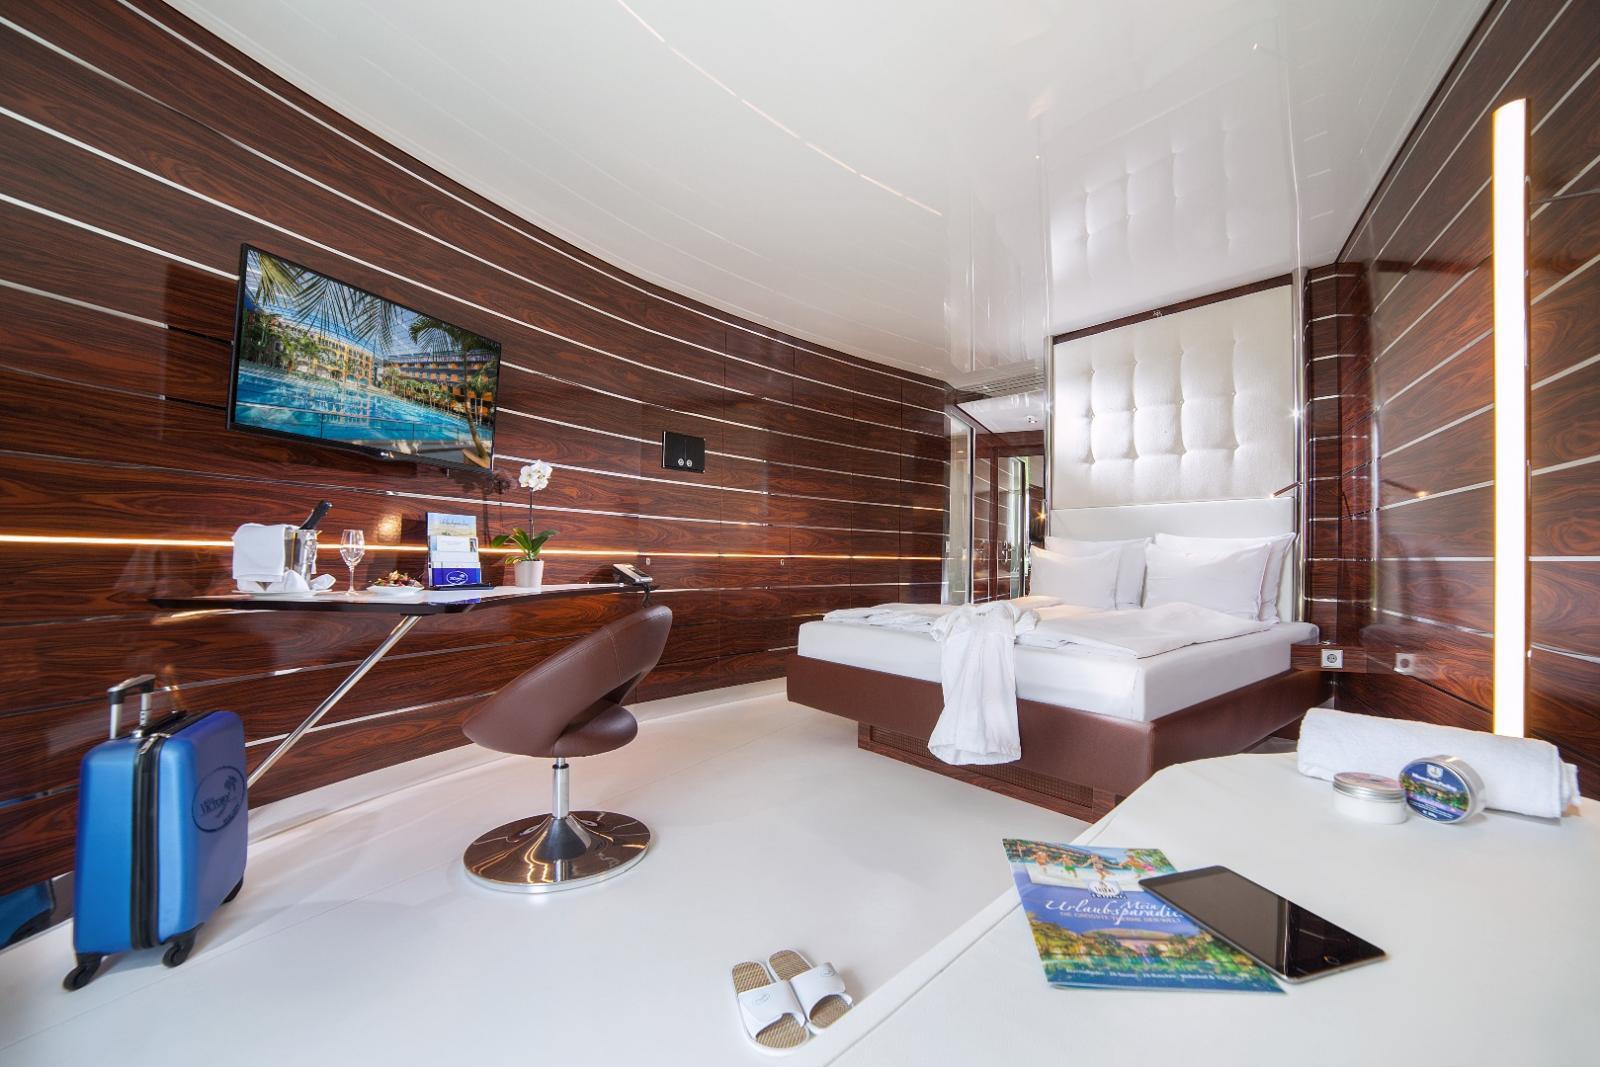 hotel victory therme erding erding hotelbewertung. Black Bedroom Furniture Sets. Home Design Ideas